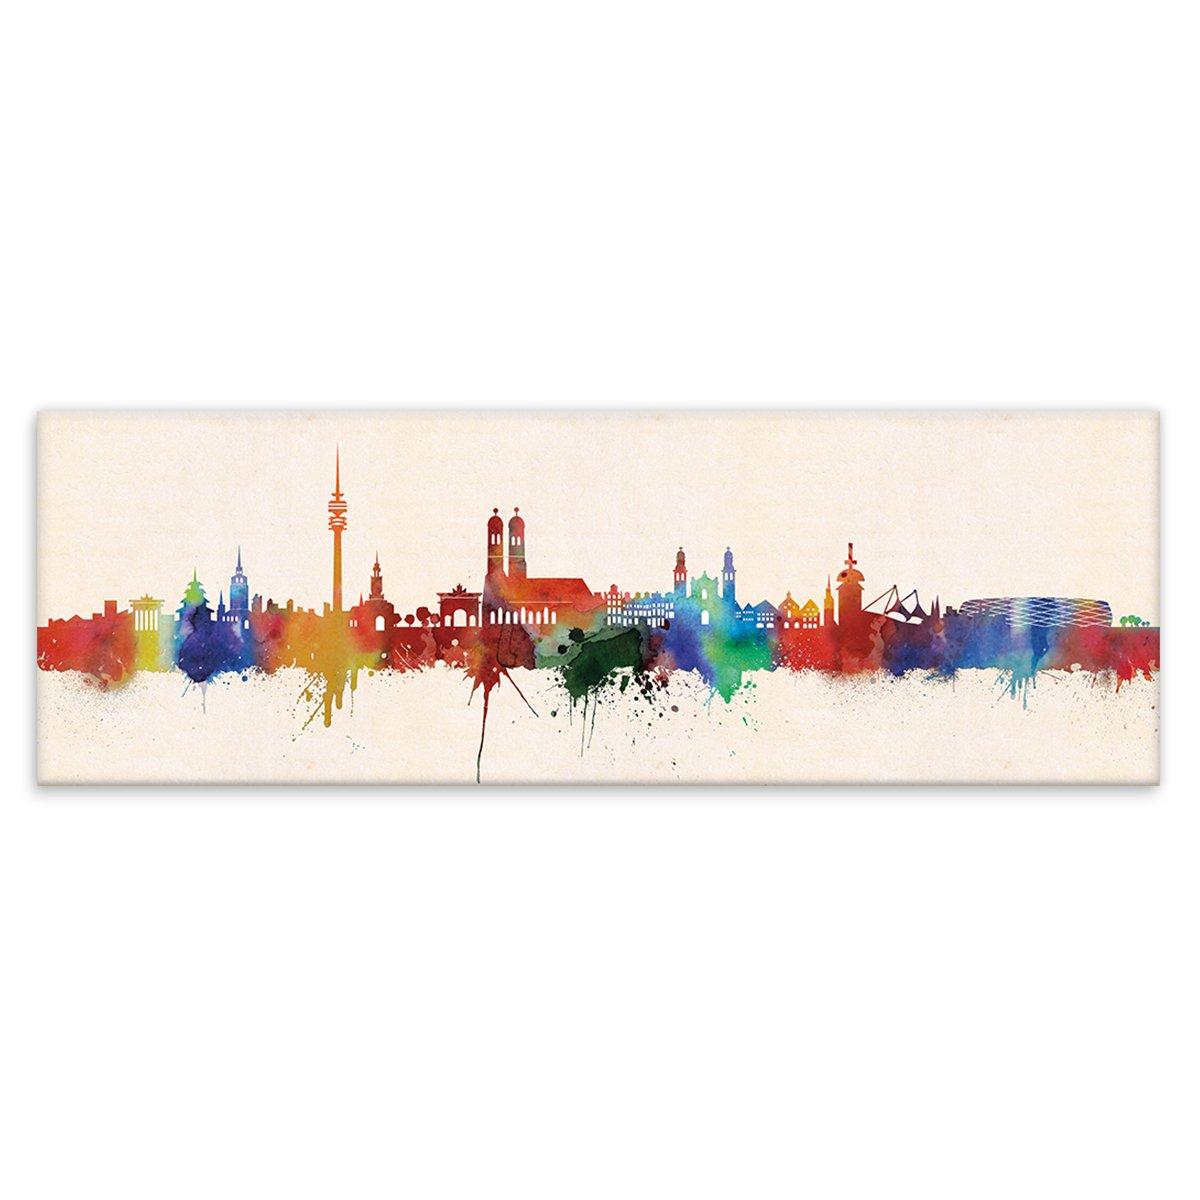 Kunstbruder Skyline Wandbild Wandbild Wandbild Städte Farbe 30x90cm Wolfsburg - Kunst Druck auf Leinwand 625fa2